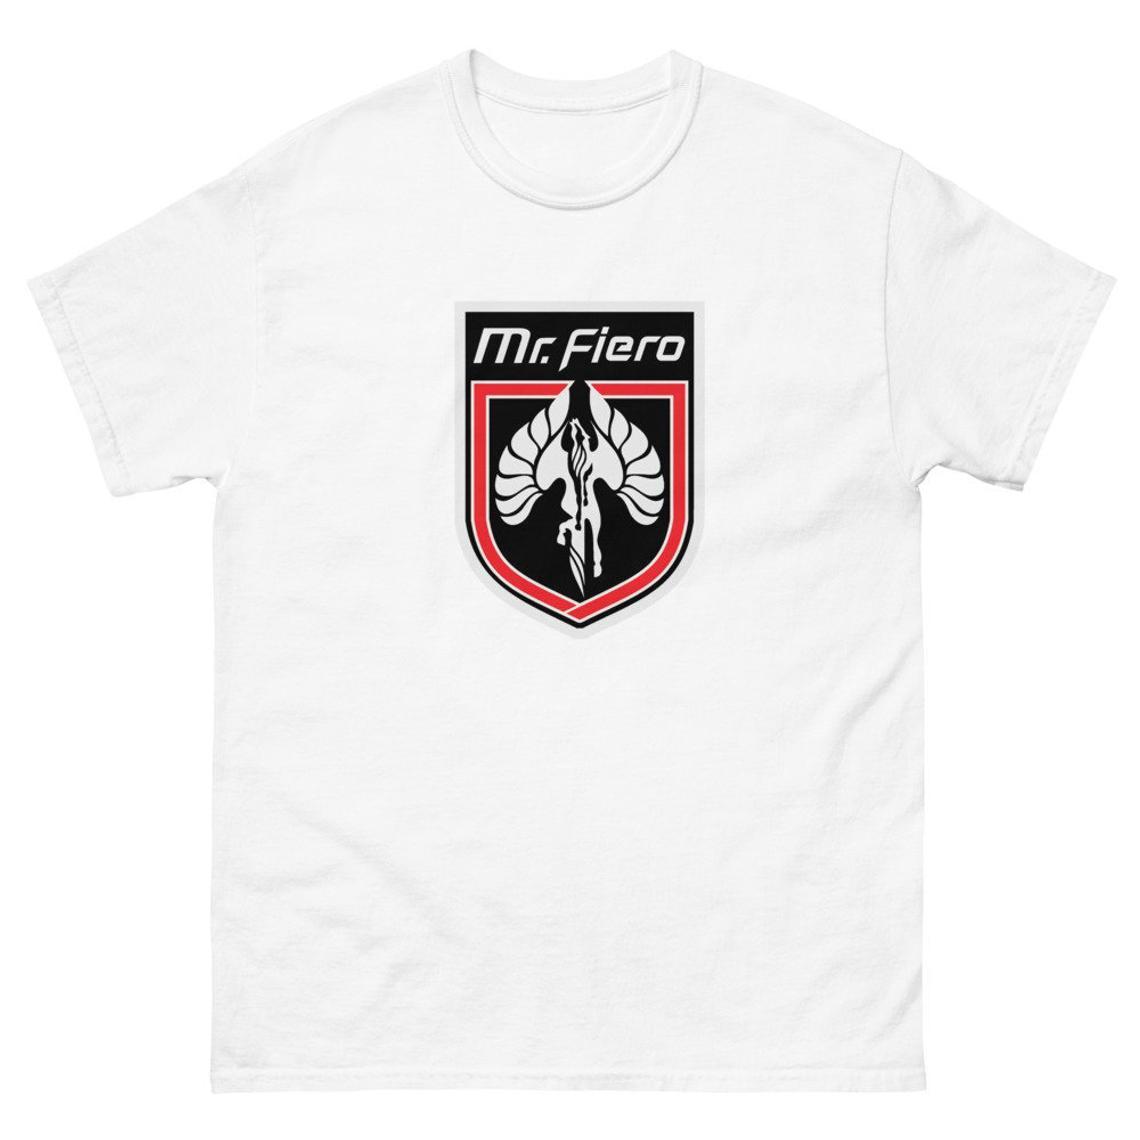 Mr. Fiero T-Shirt